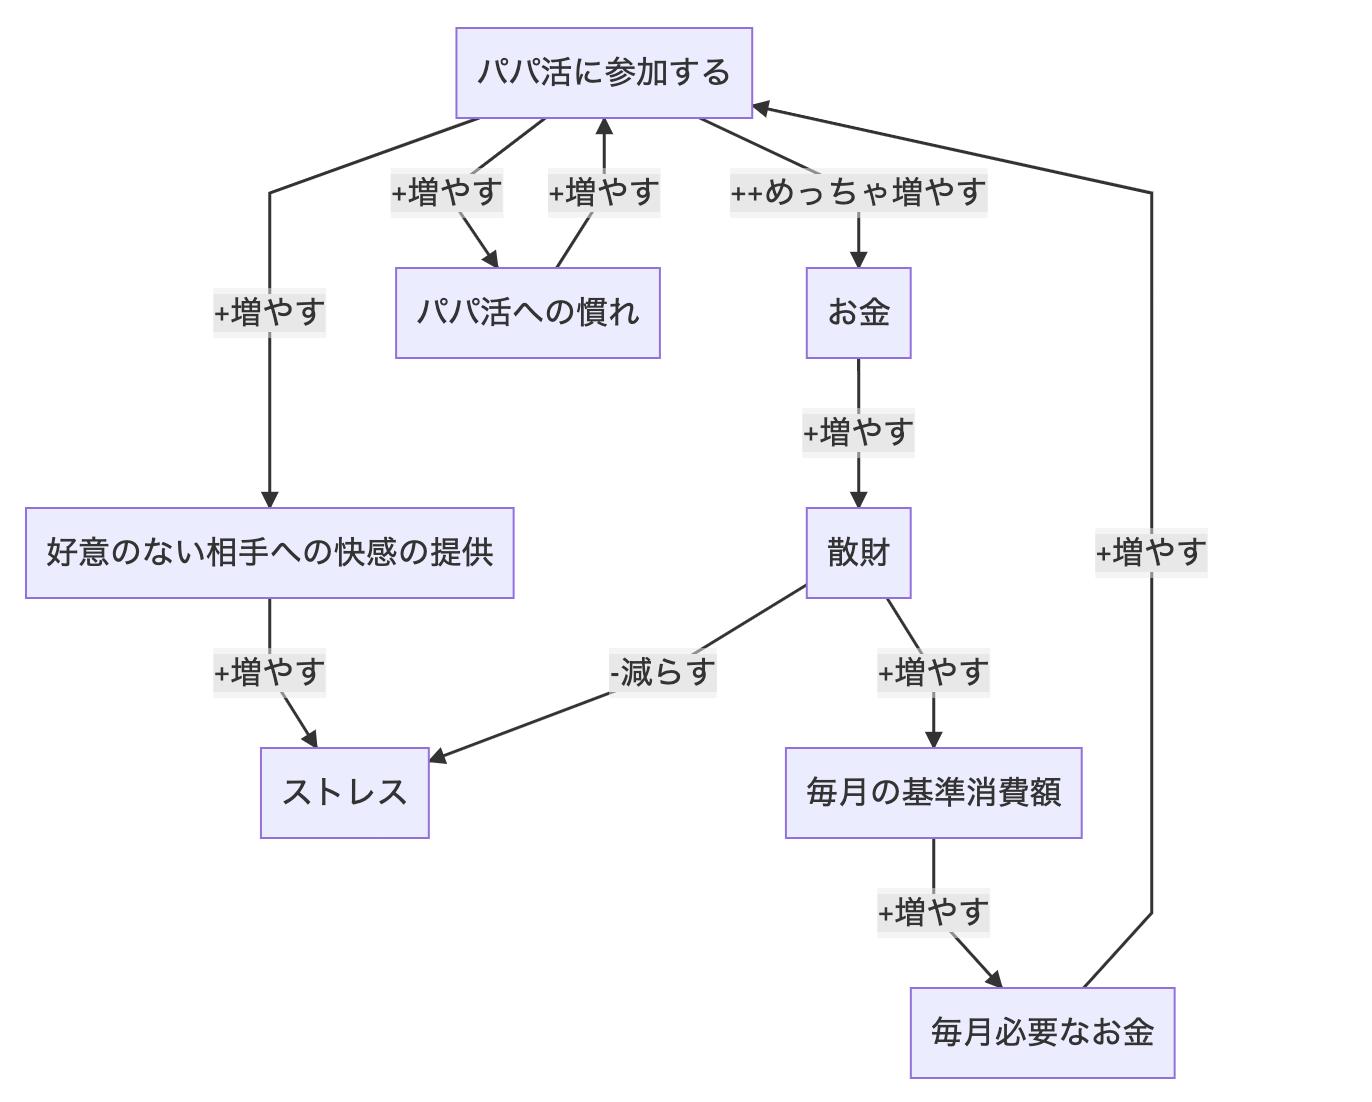 josei-papakatsu-image